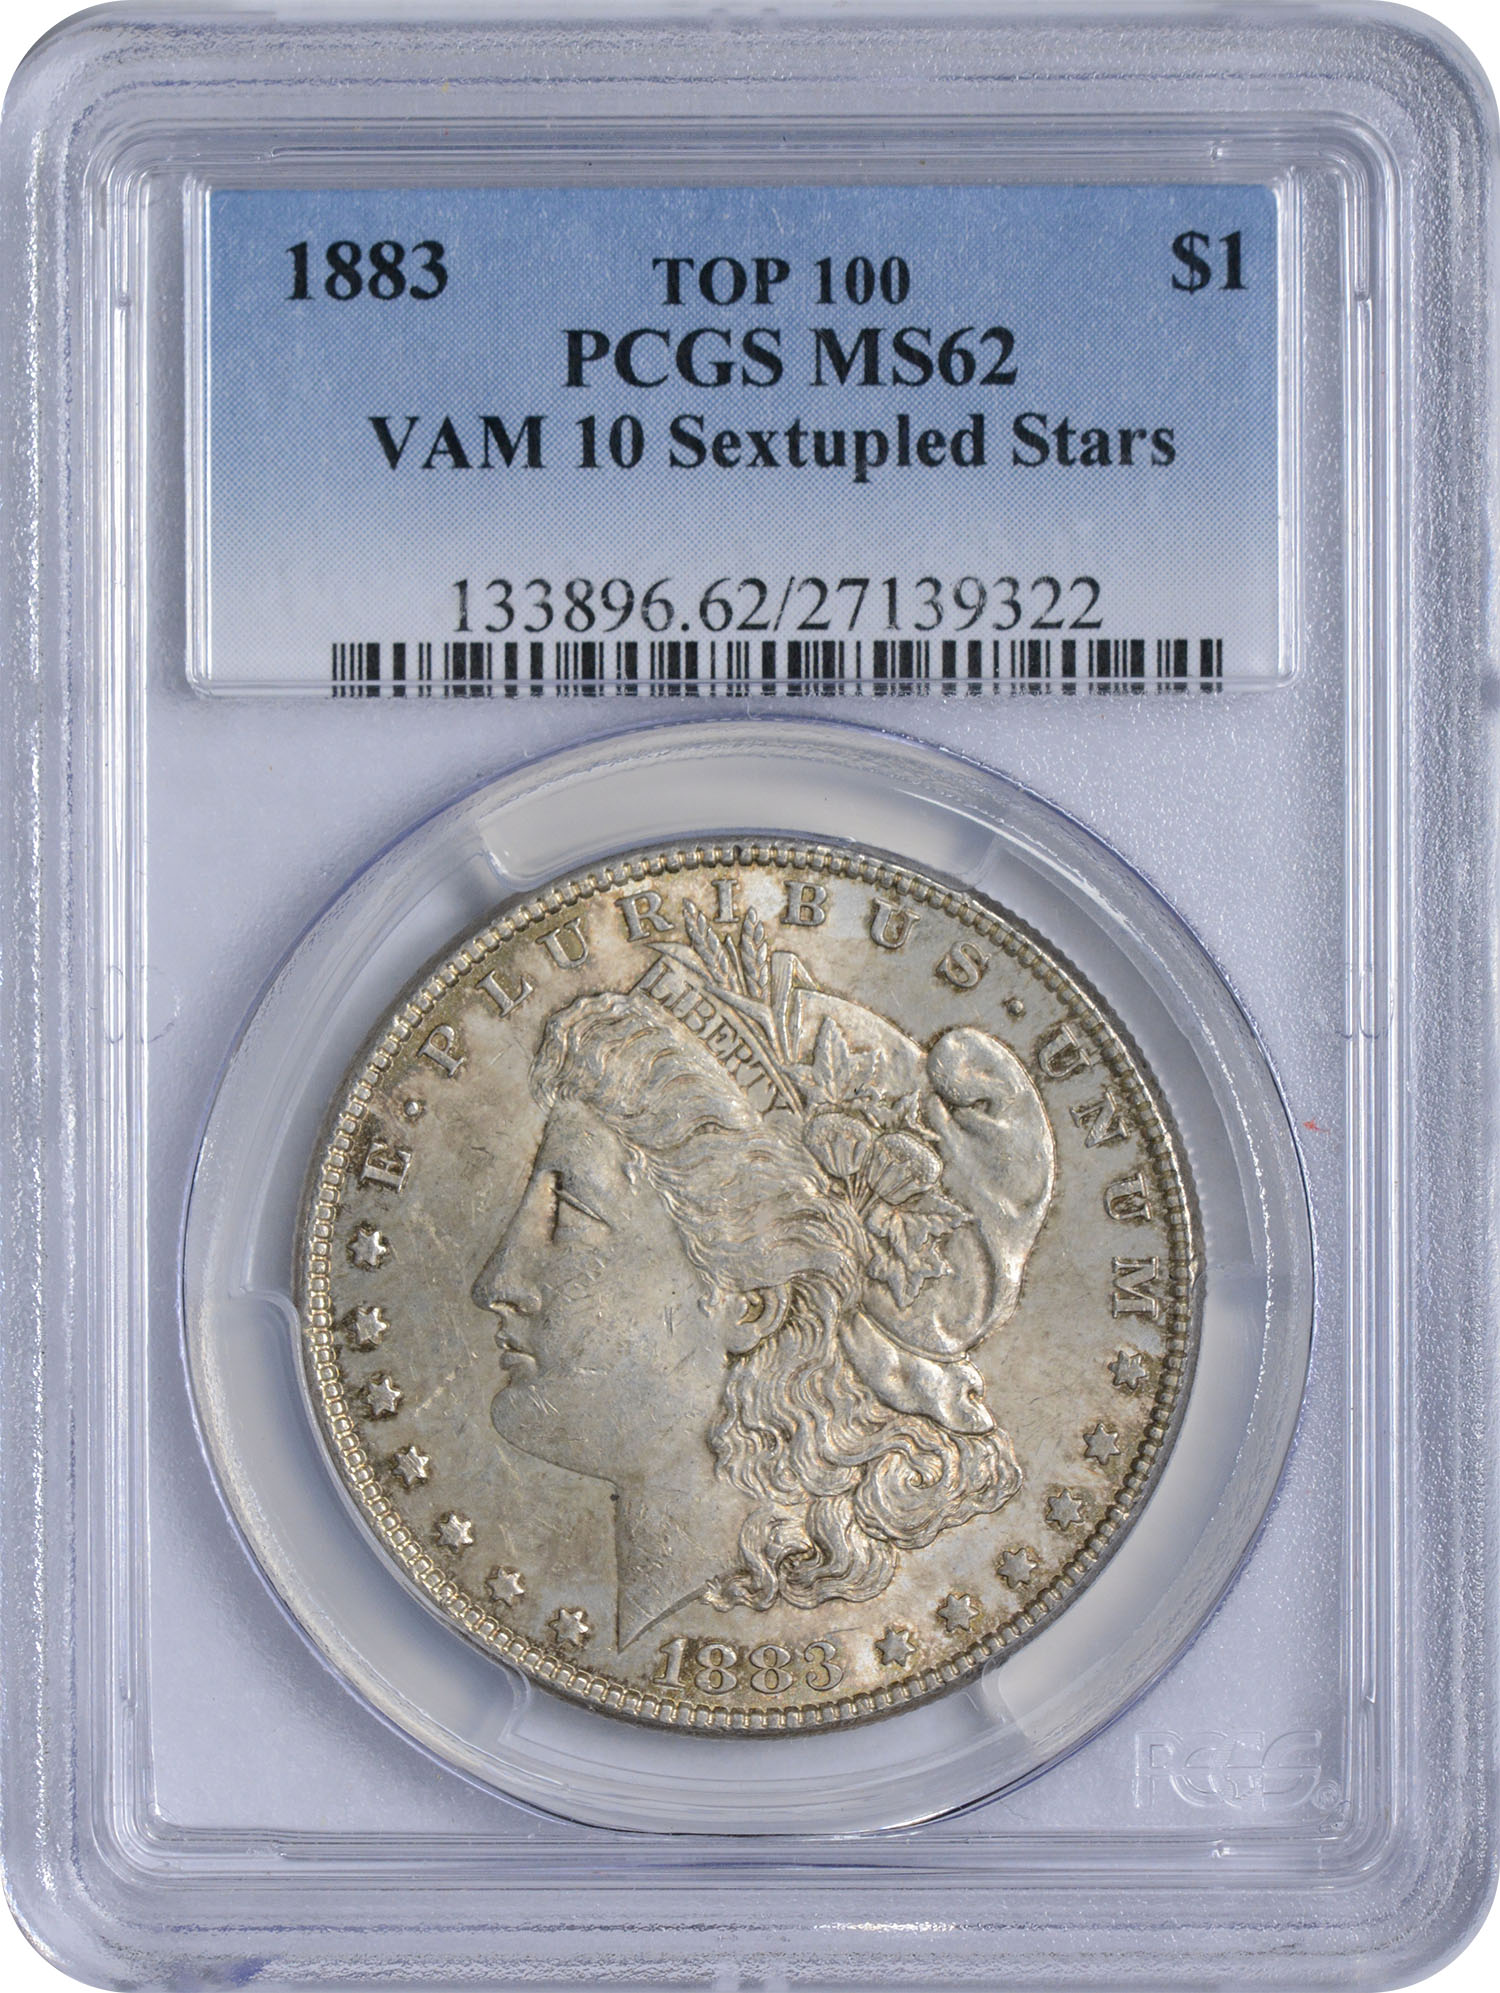 1883 VAM 10 Morgan Silver Dollar Sextupled Stars MS62 PCGS